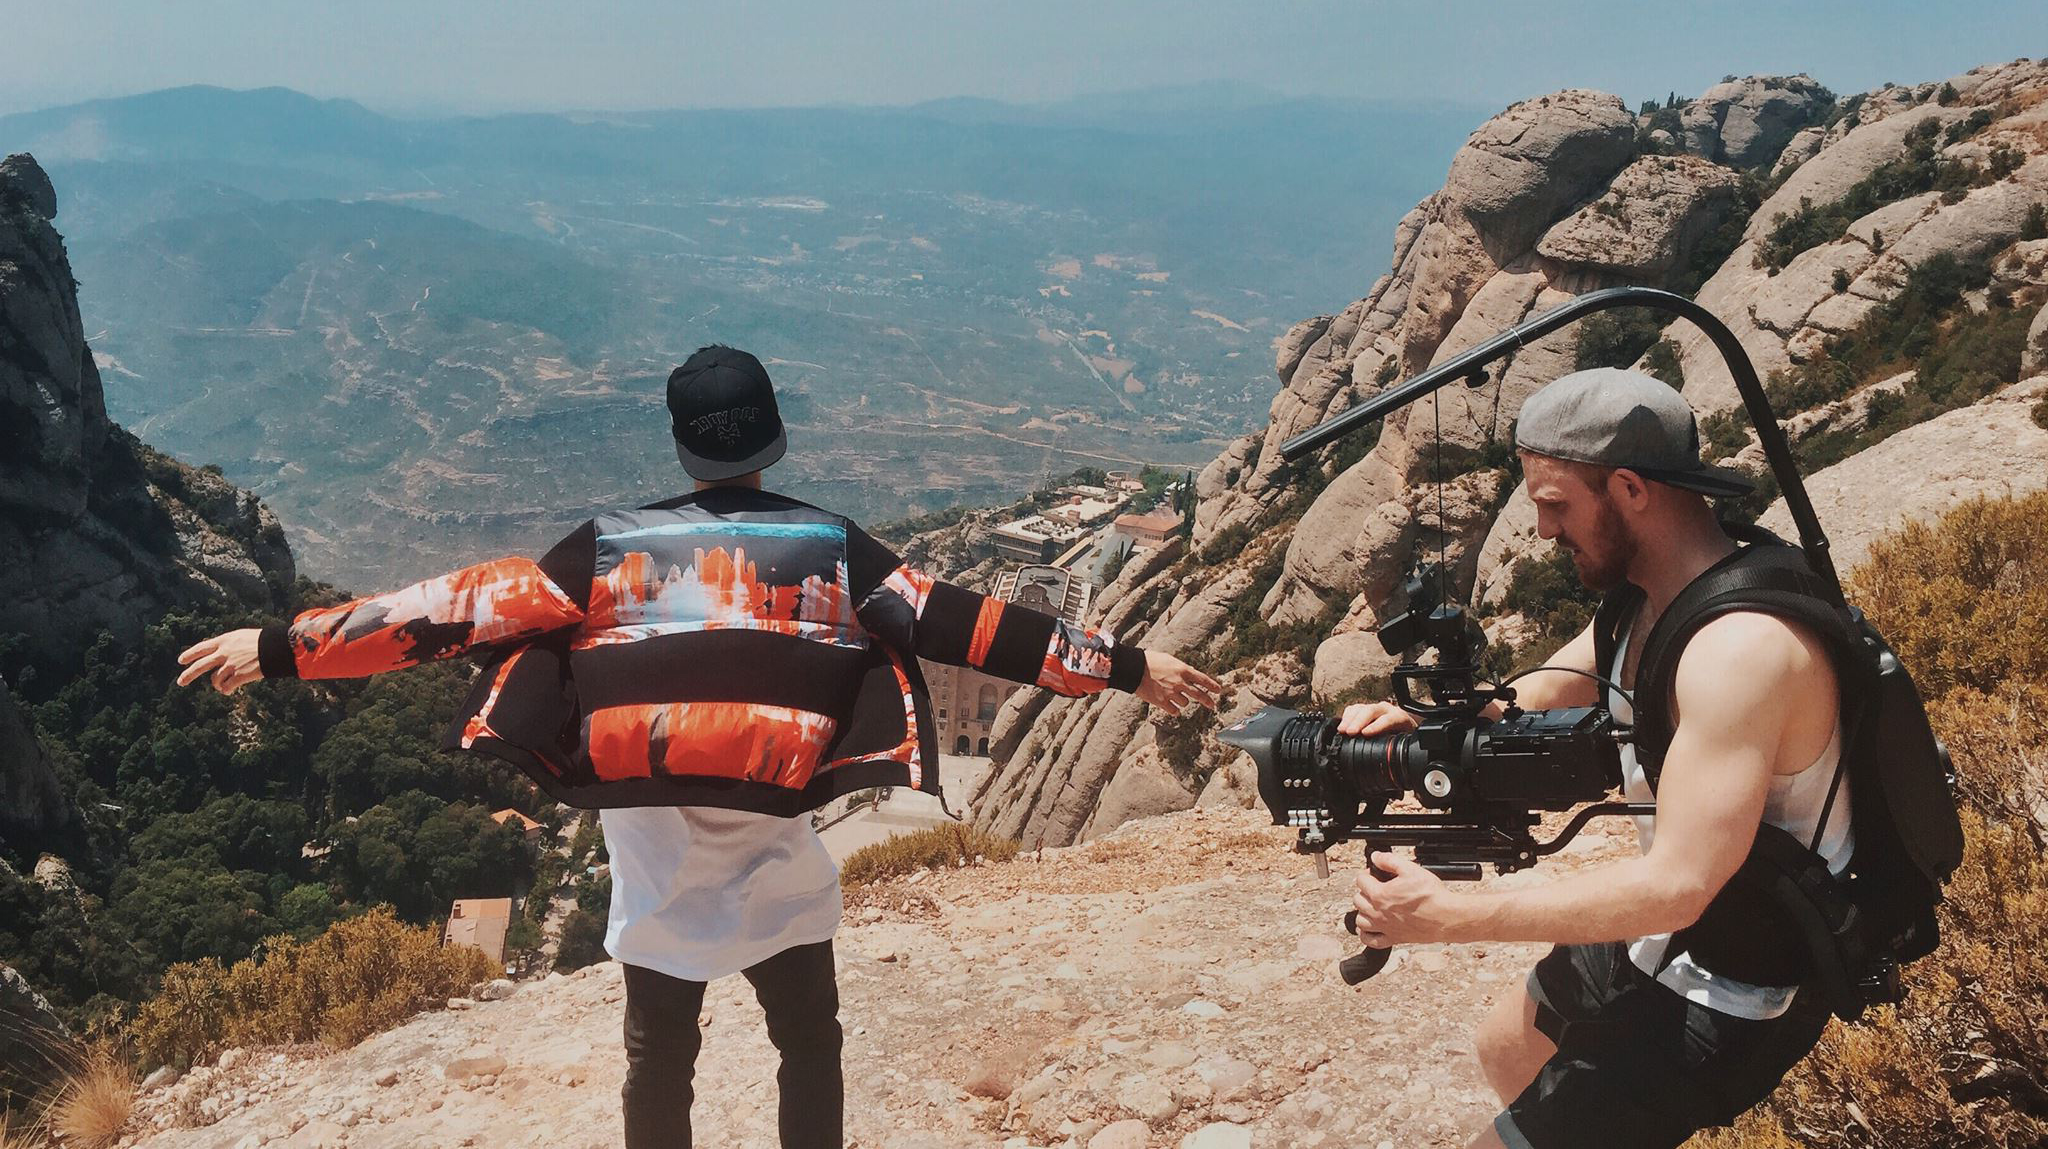 Filming the music video for Saint James 'Daytona'